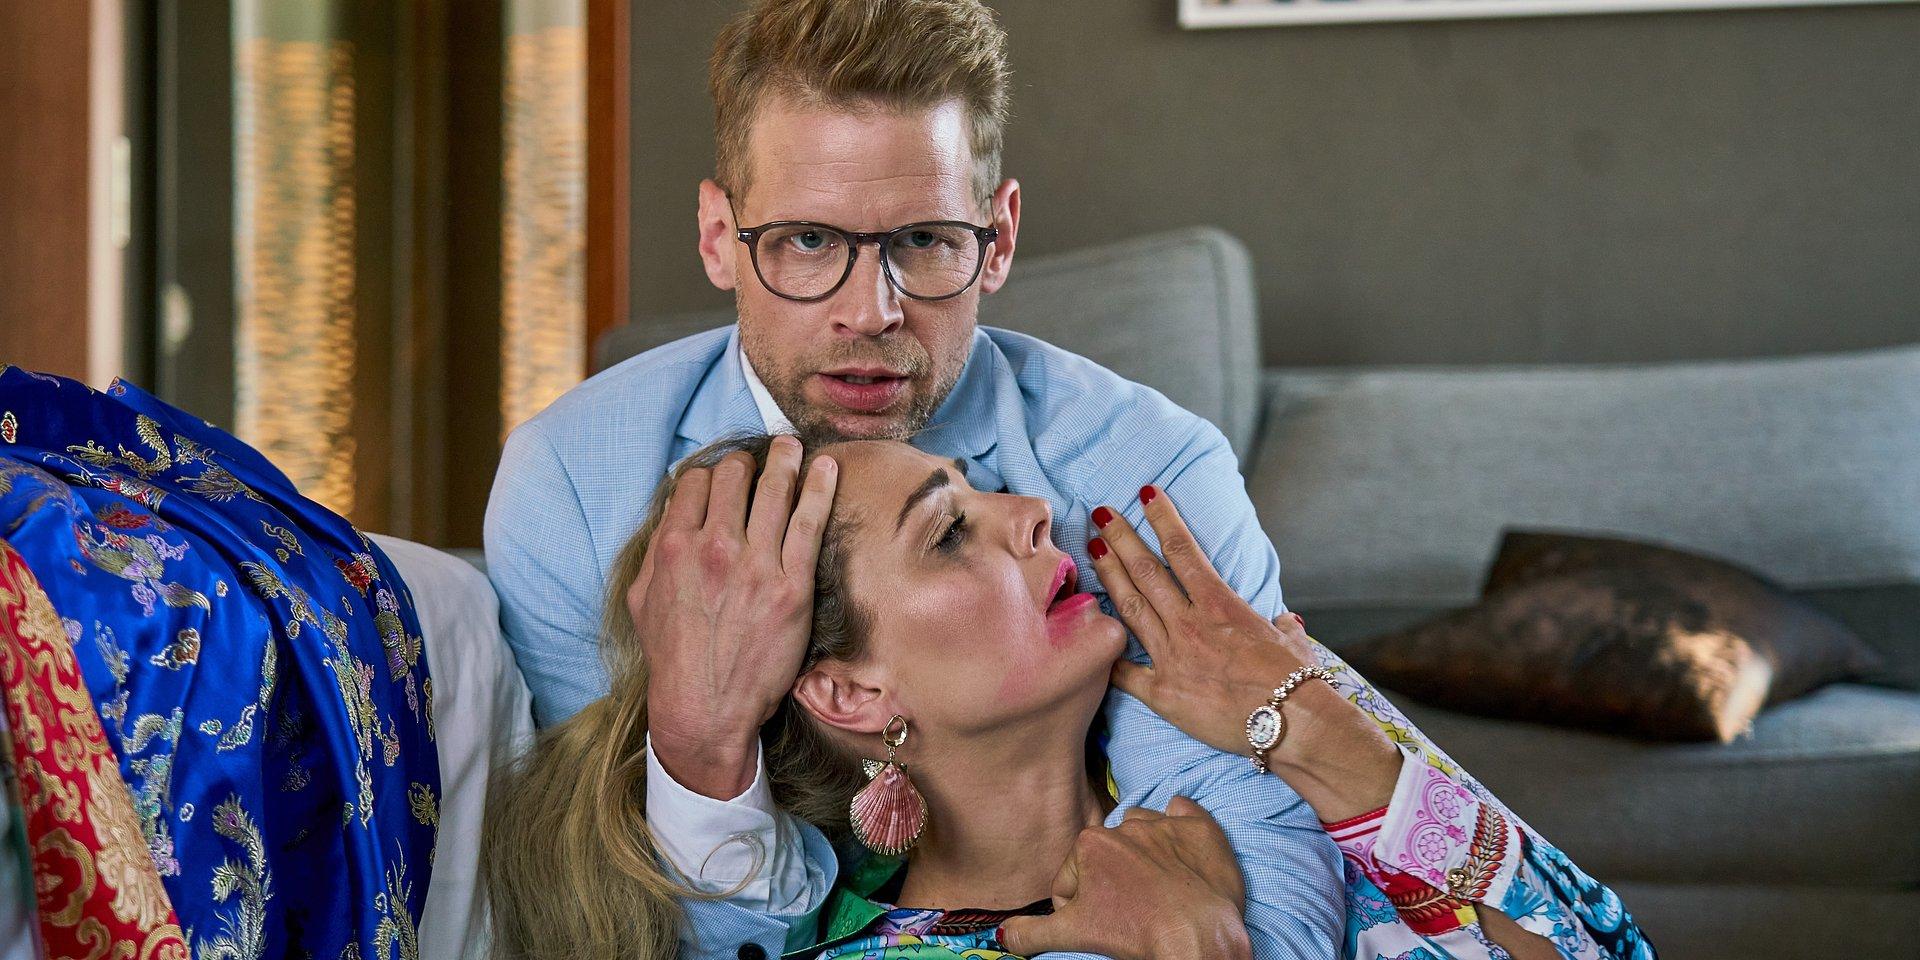 BrzydUla: Sebastian ratuje Violettę z opresji!